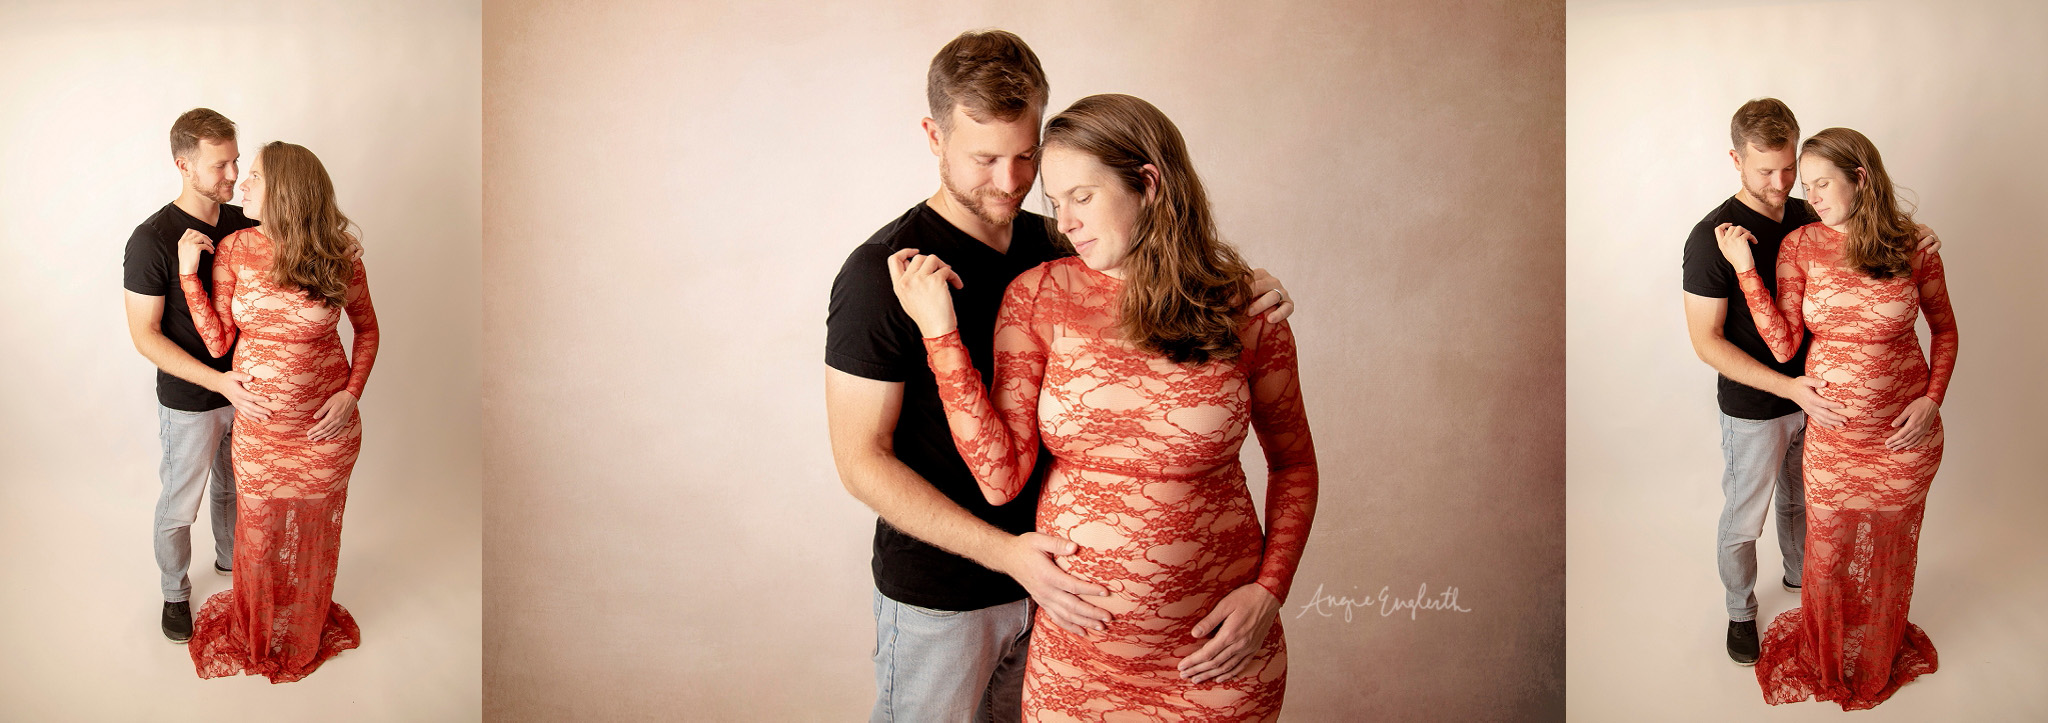 lancaster_maternity_photographer_angie_englerth_central_pa_b056.jpg